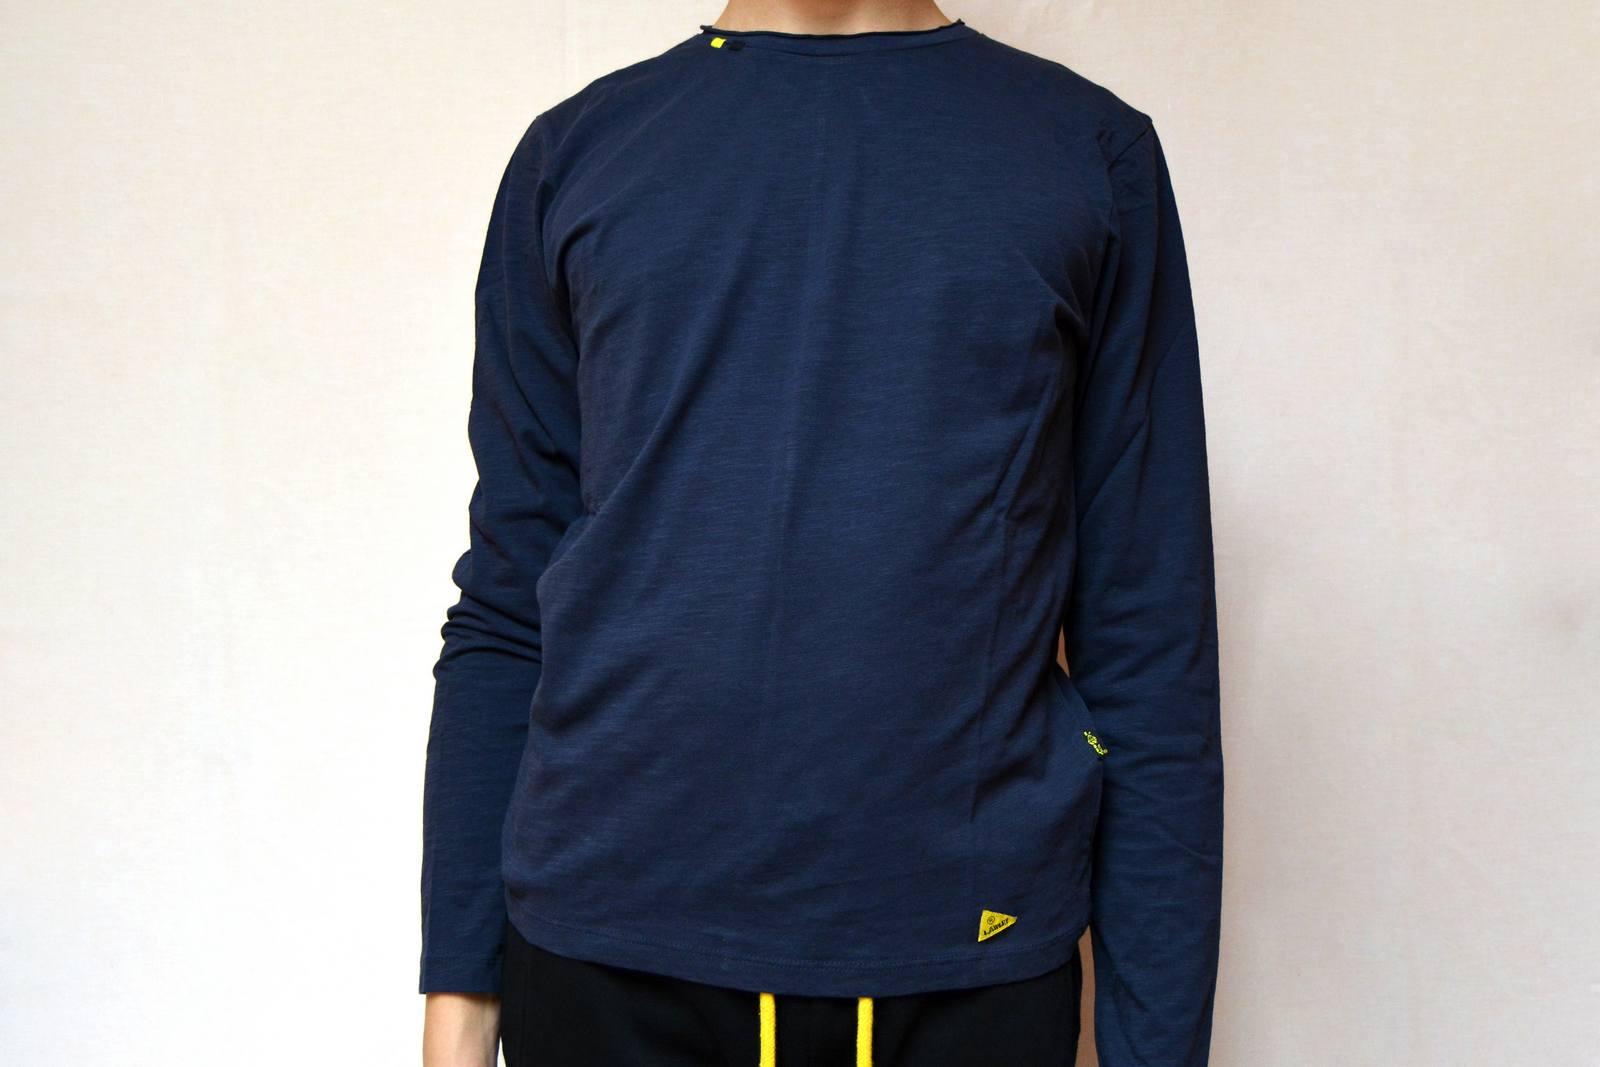 T shirt manica lunga uomo blu, logo